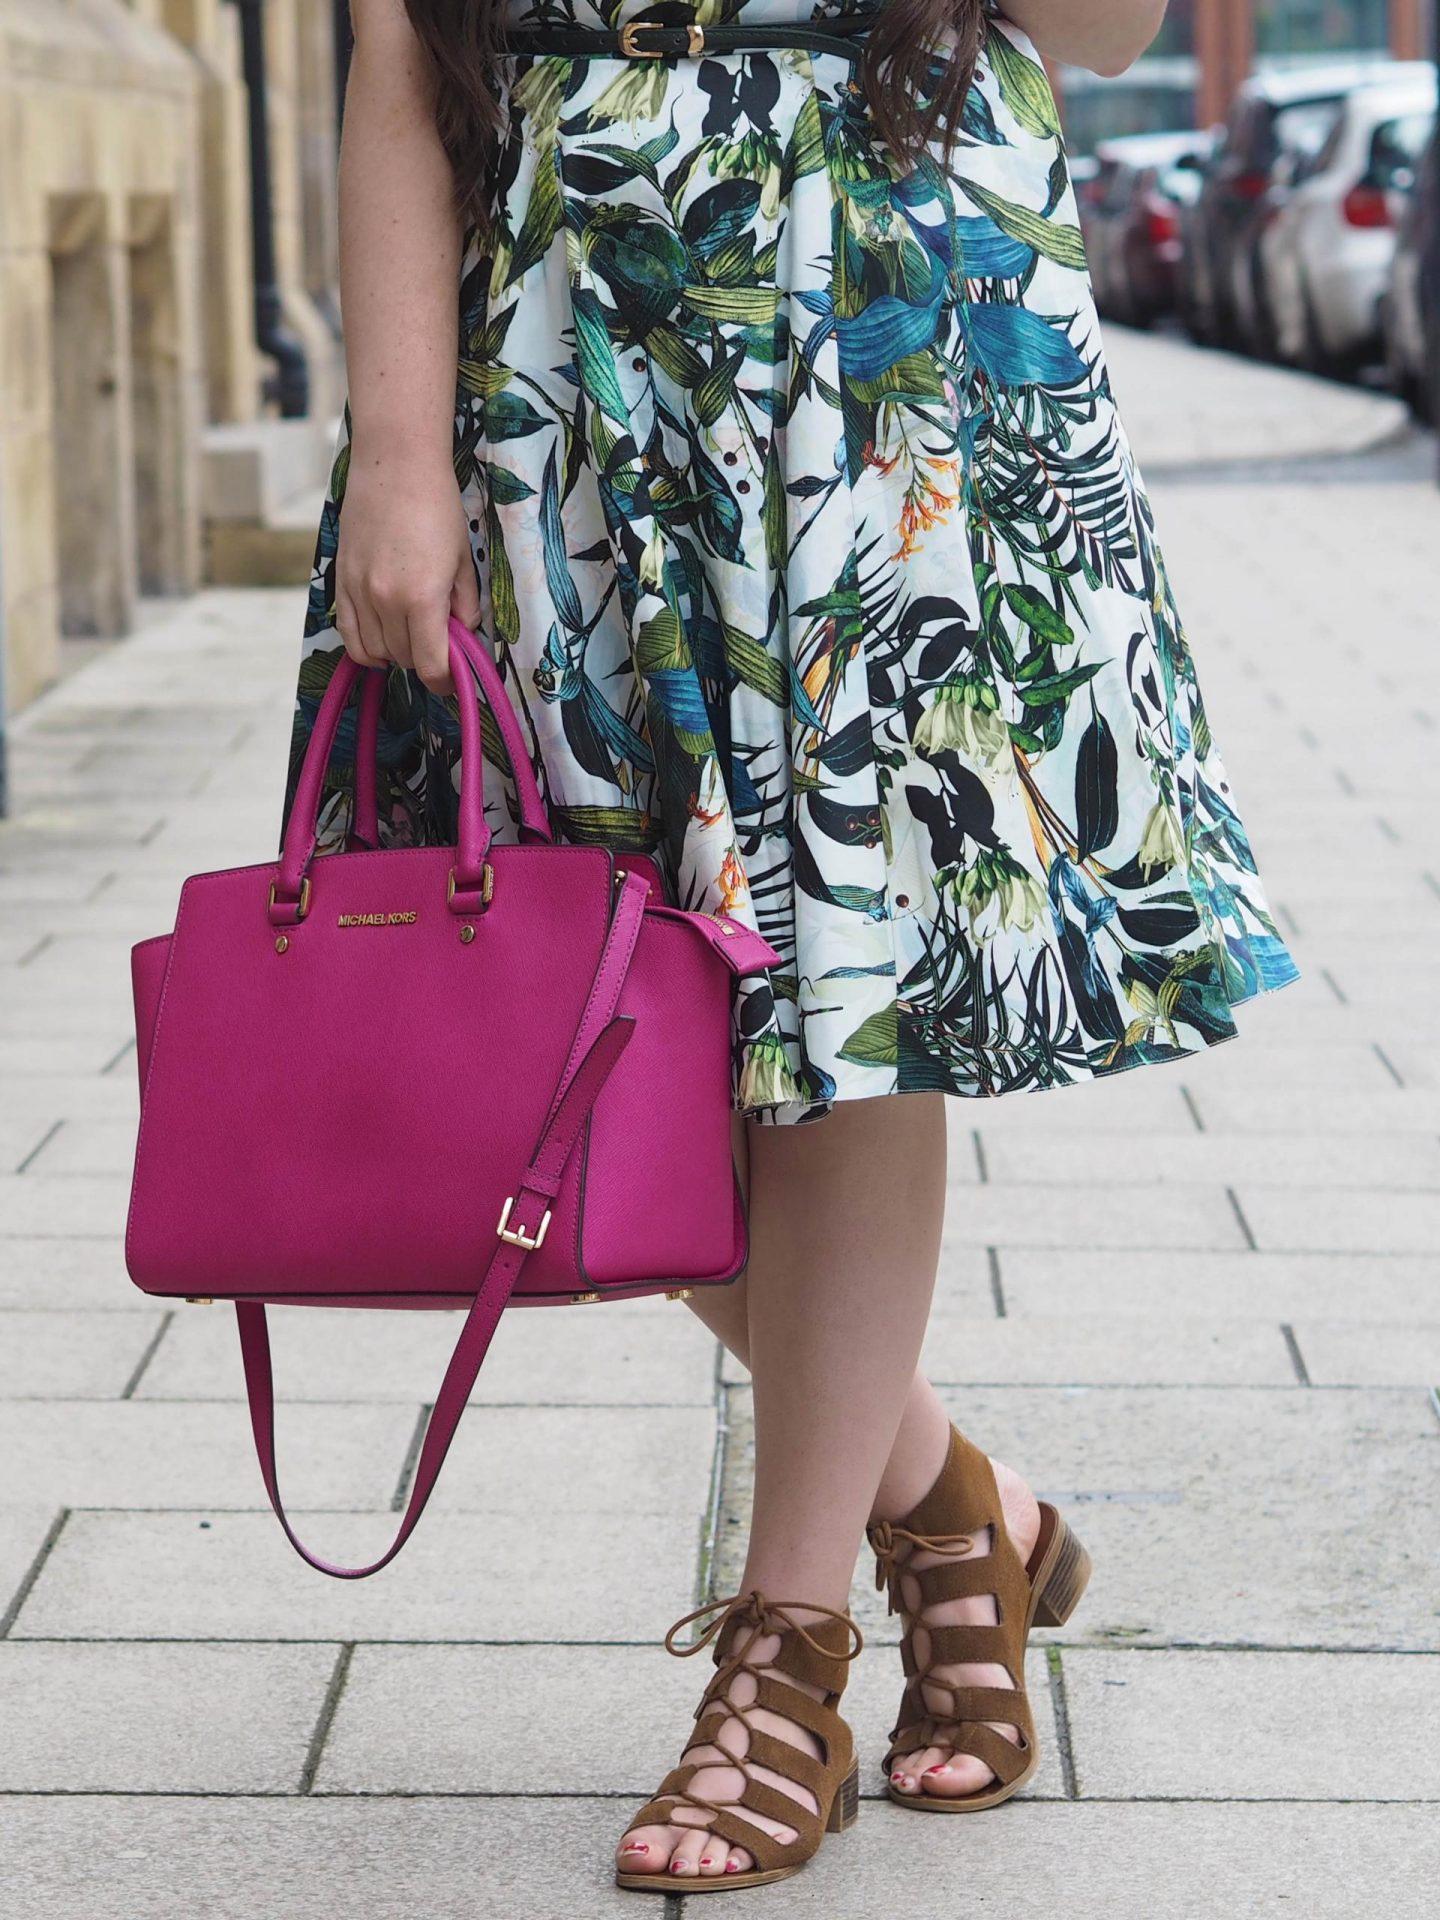 Ladies Who Brunch, Closet London - Rachel Nicole UK Fashion Blogger